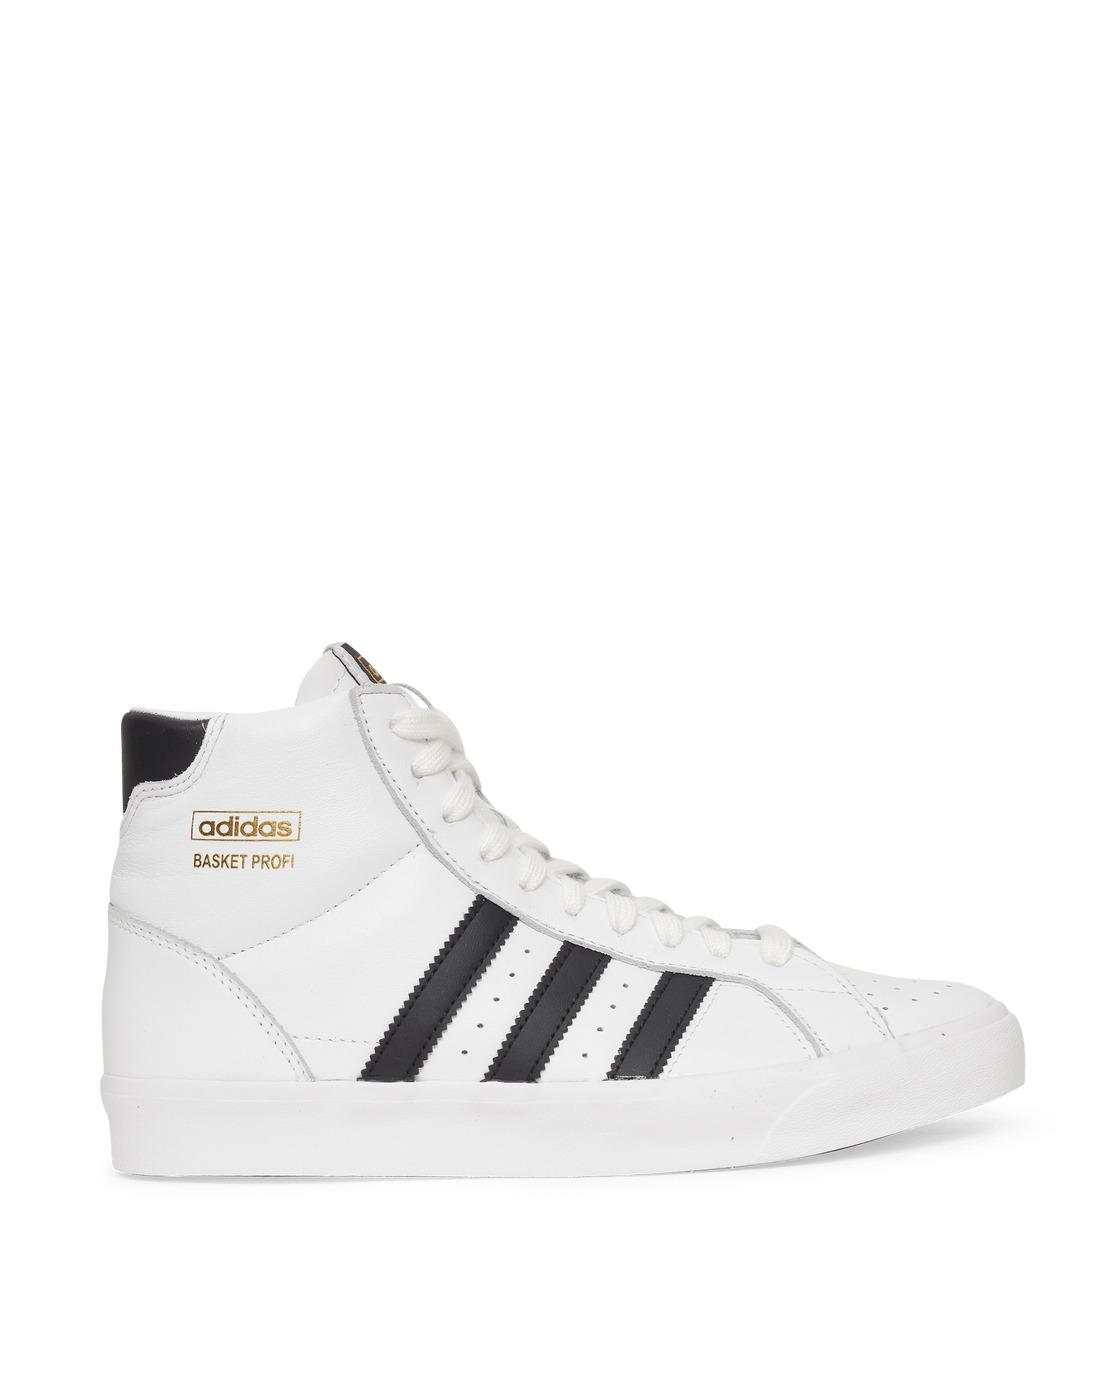 Photo: Adidas Originals Basket Profi Sneakers Ftwr White/Core Black